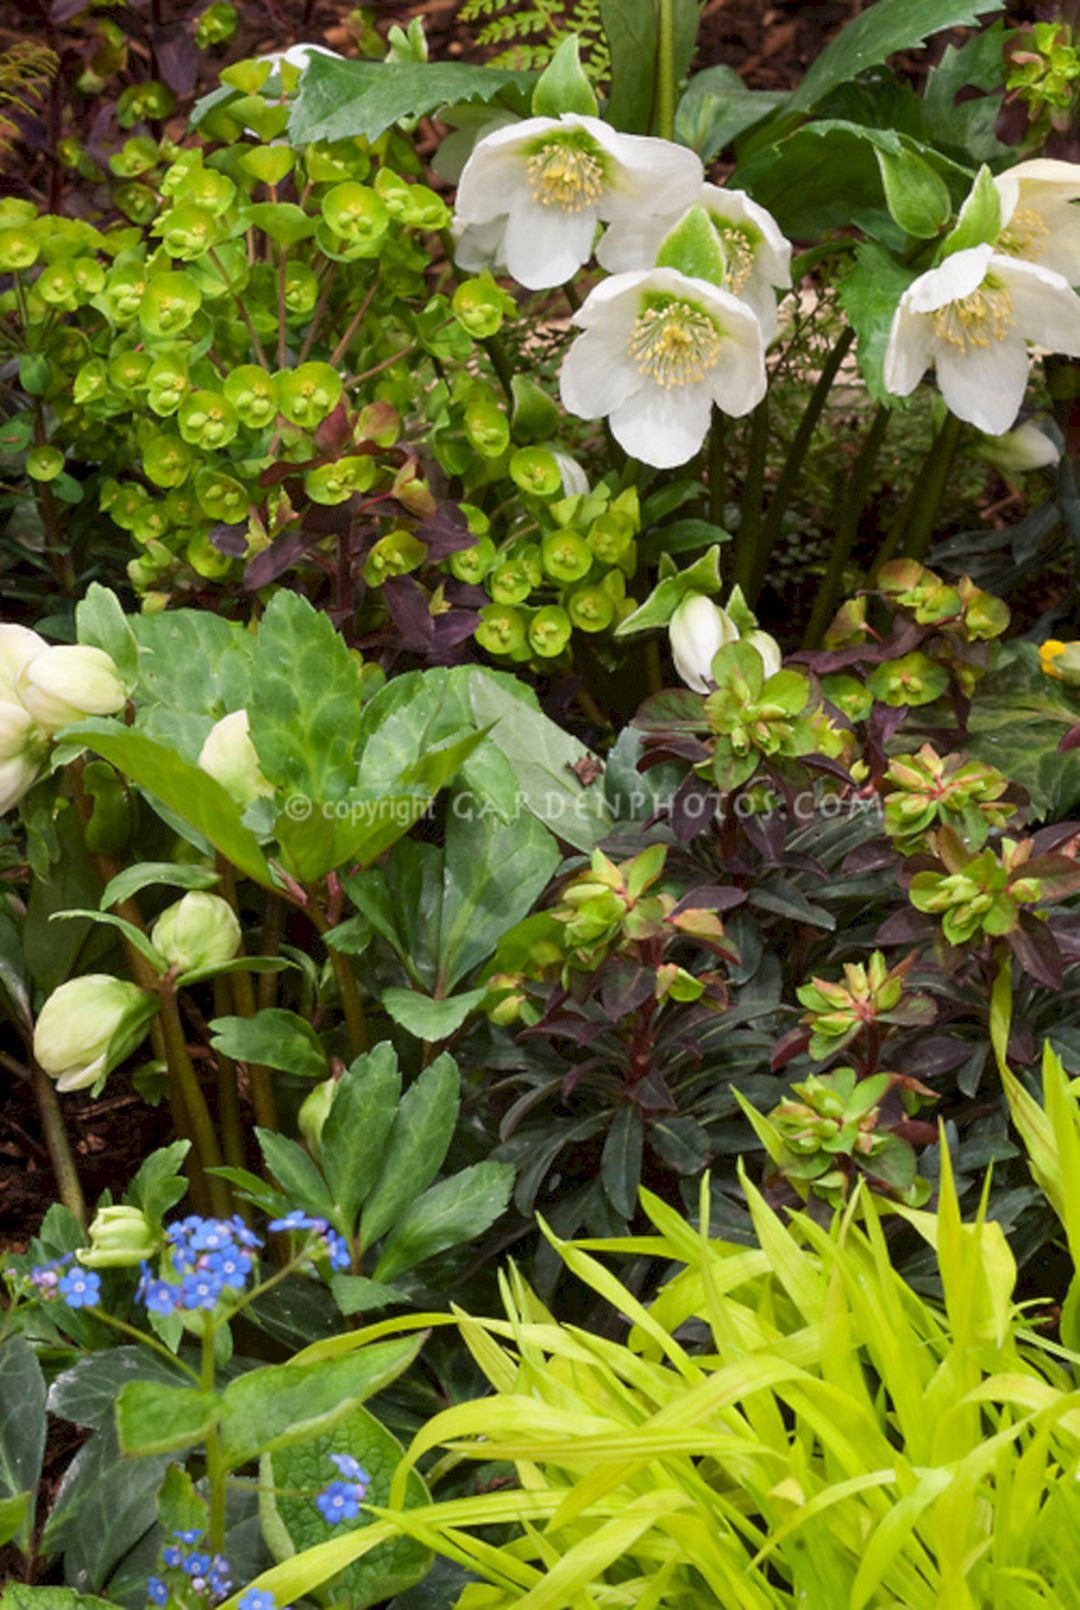 Astounding 75+ Best Planting Combination Ideas For Beautiful Garden Https://freshouz.com/75-best-planting-combi… | Beautiful Flowers Garden, Euphorbia Plant, Plants